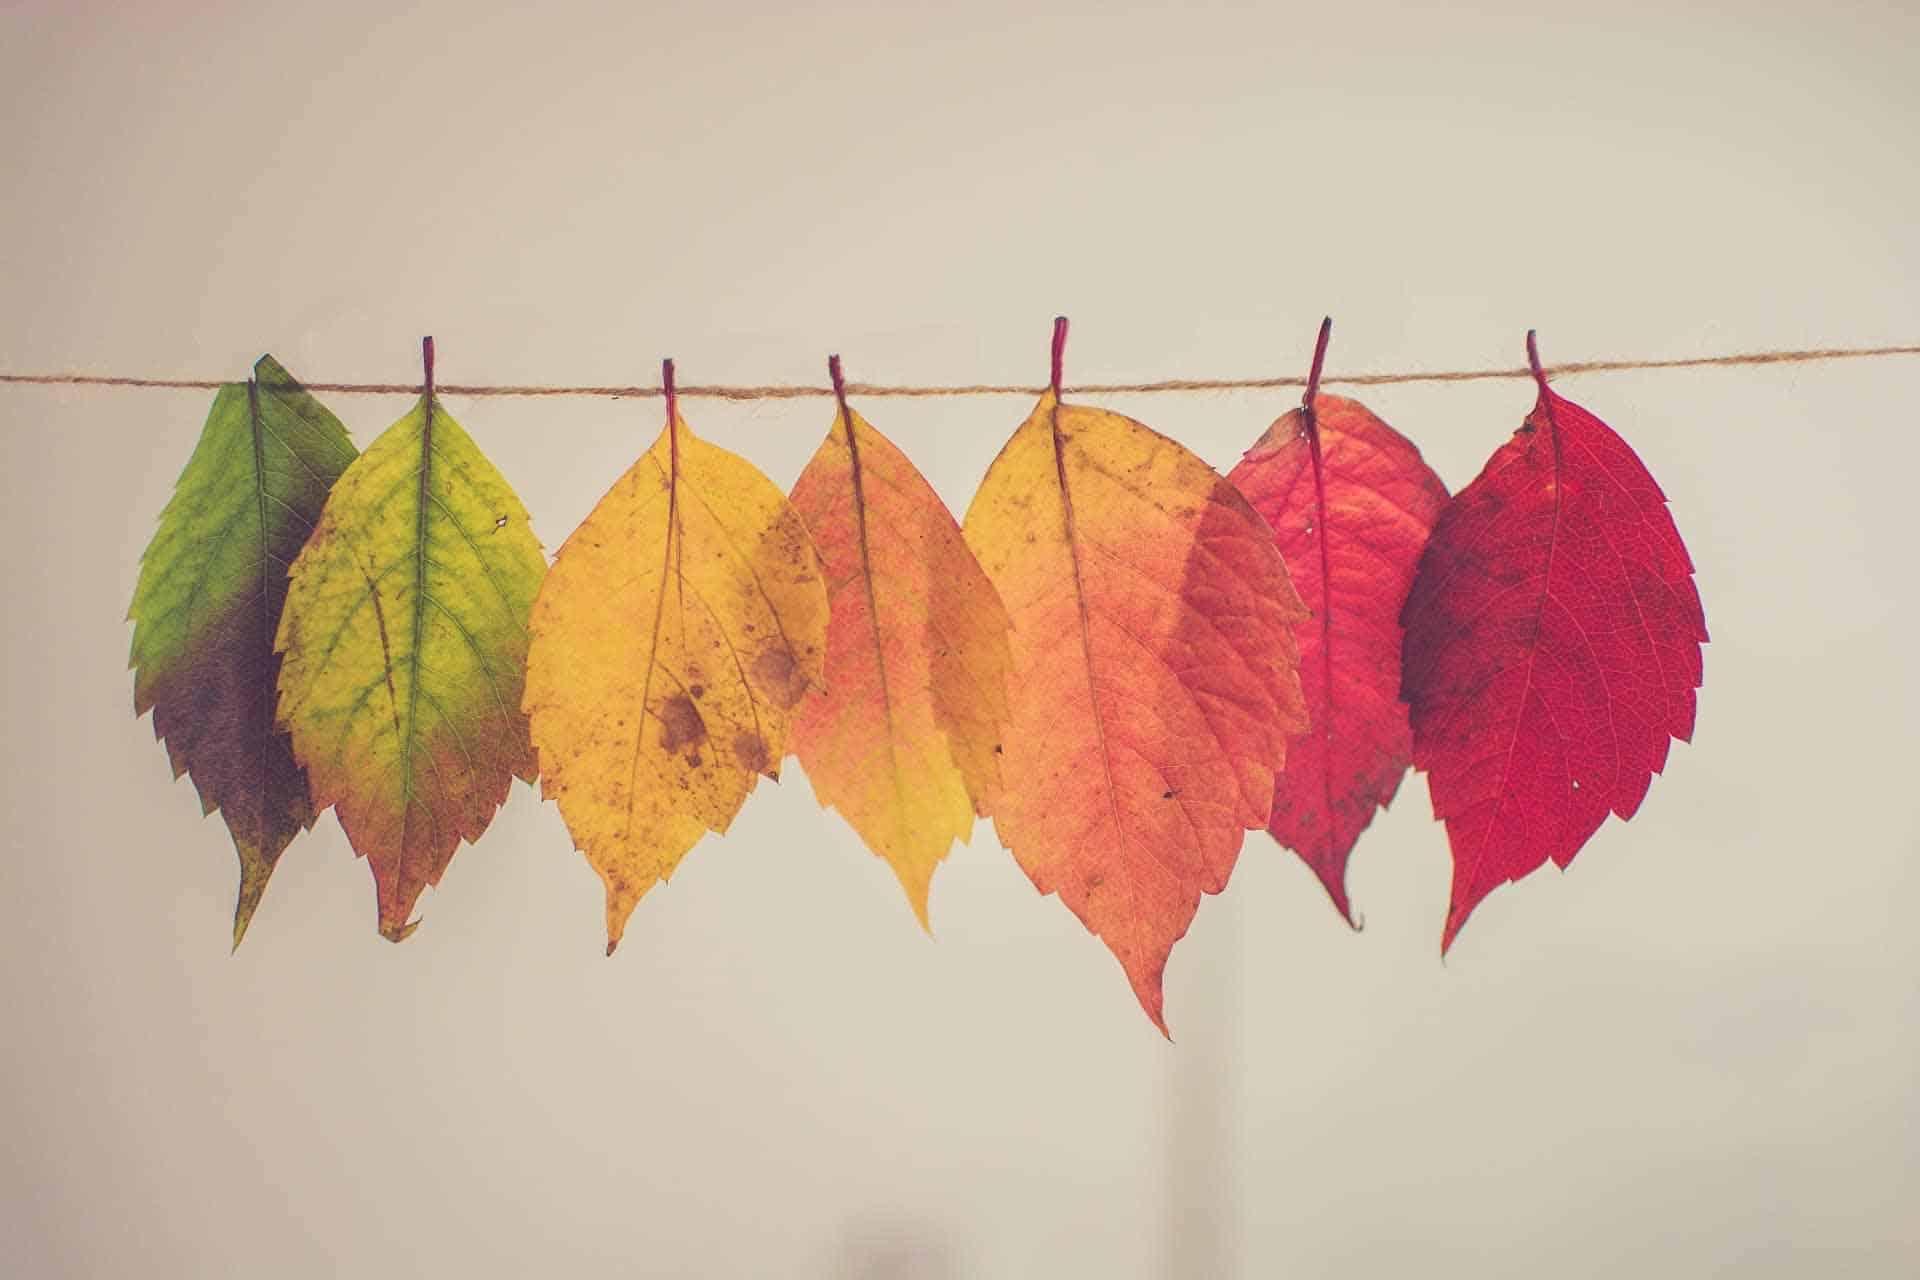 t2informatik Blog: Transformation is a constant